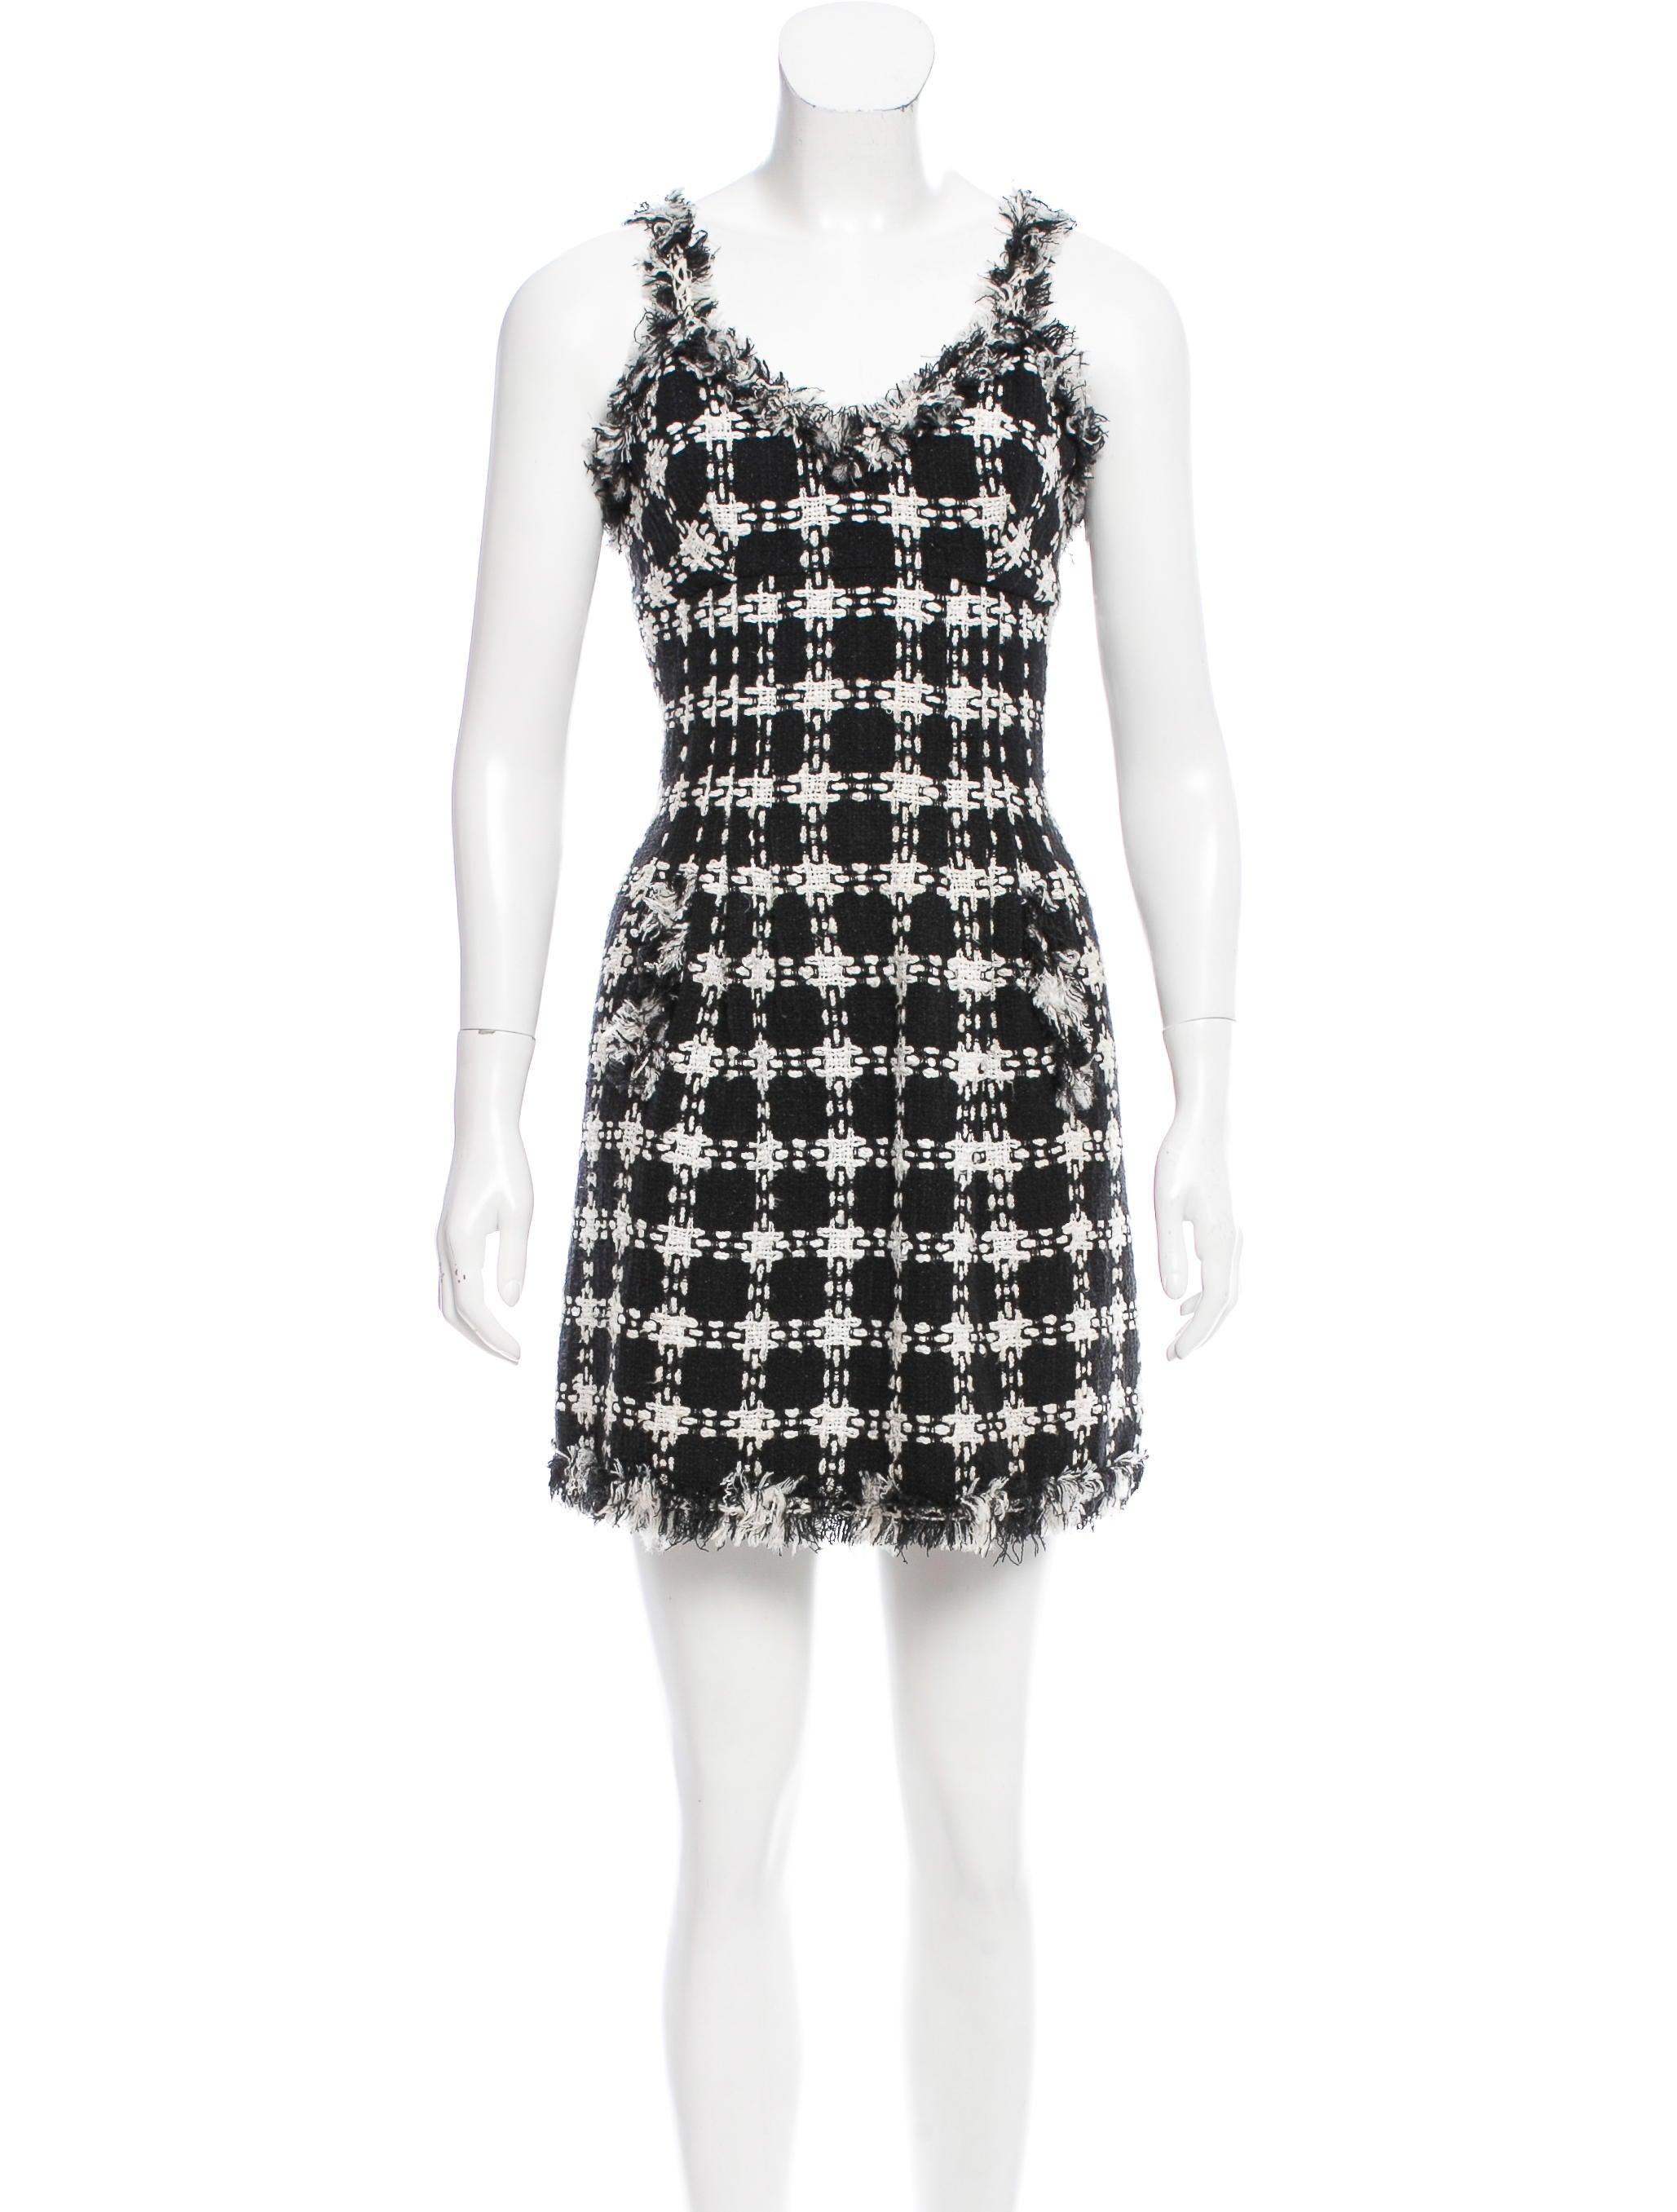 Chanel Sleeveless Tweed Dress - Clothing - CHA173530